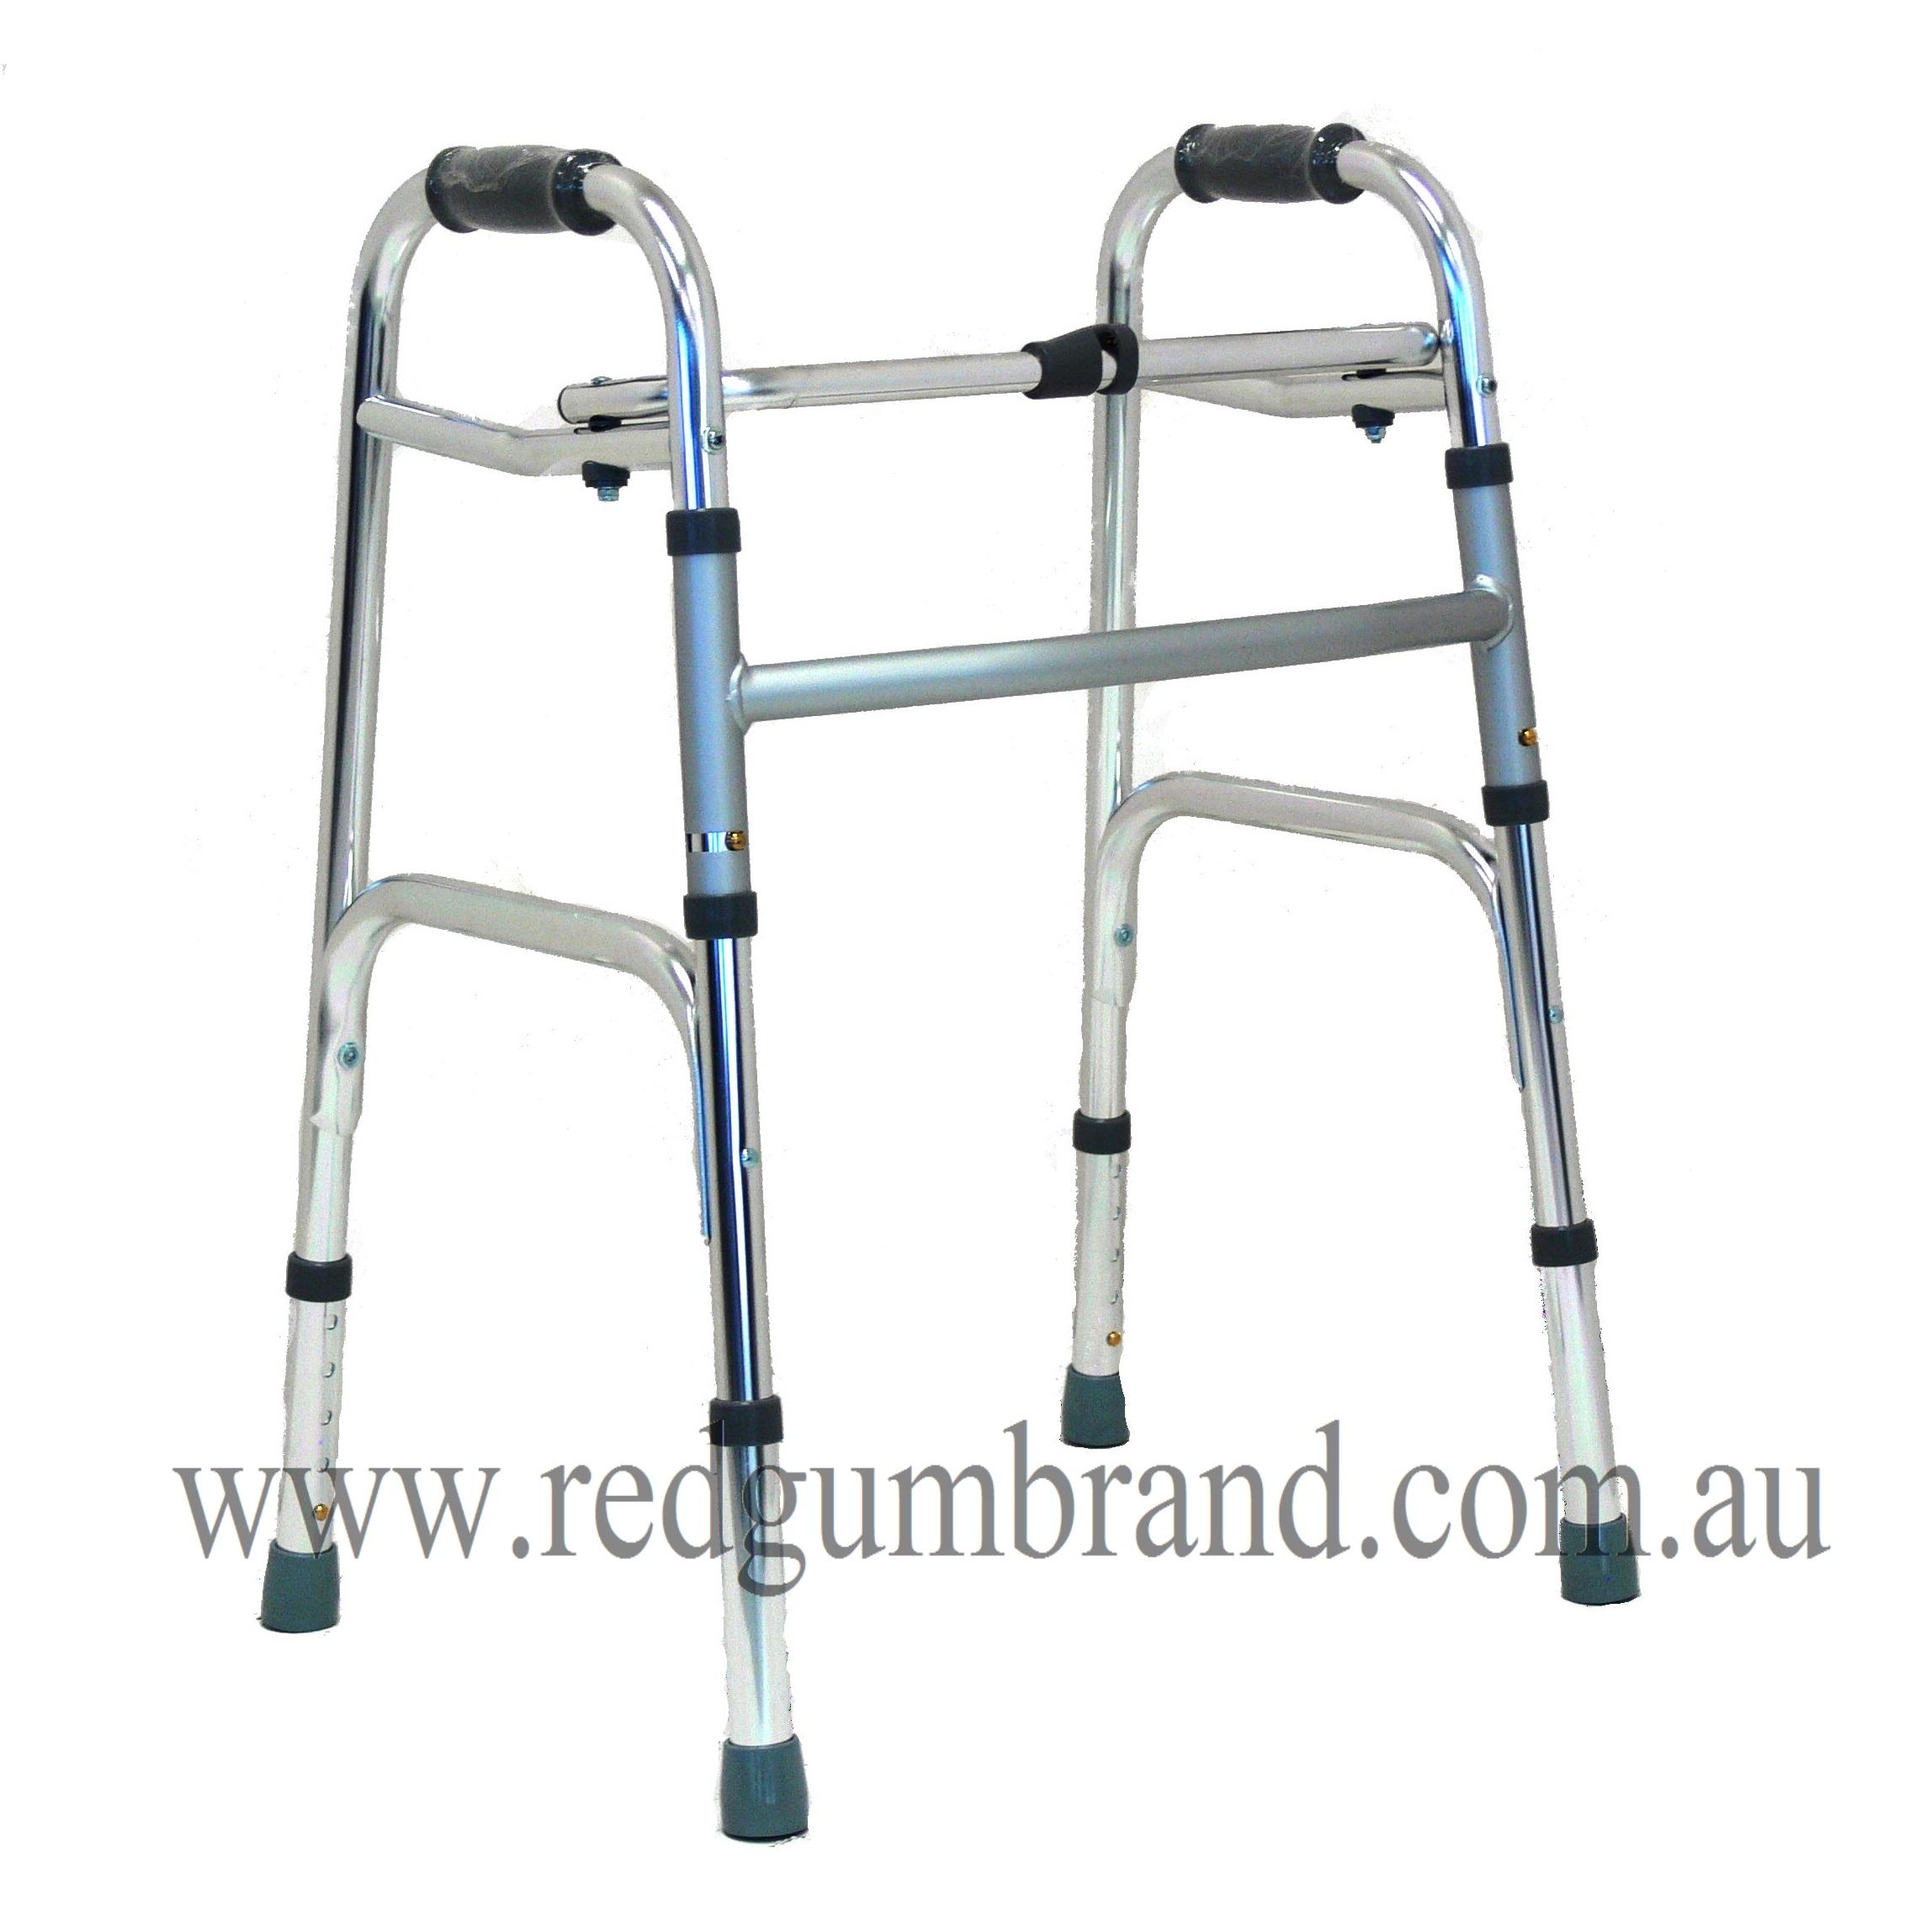 Folding walking frame (No Wheels)